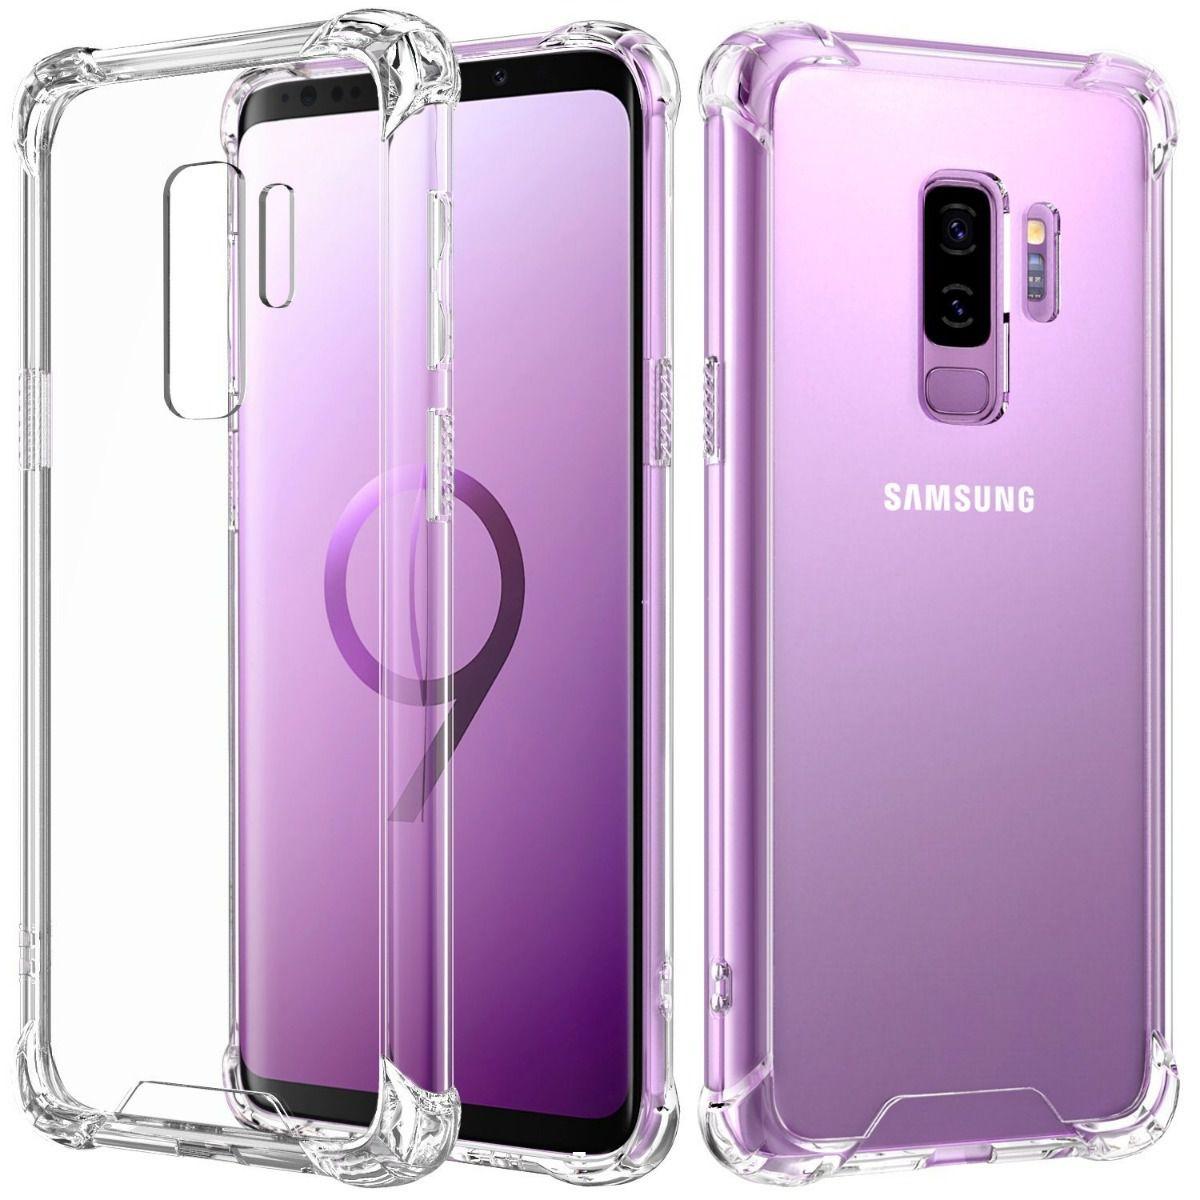 Capinha Anti-shock Transparente Samsung J5 J6 J7 J8 S6 S7 S8 PLUS